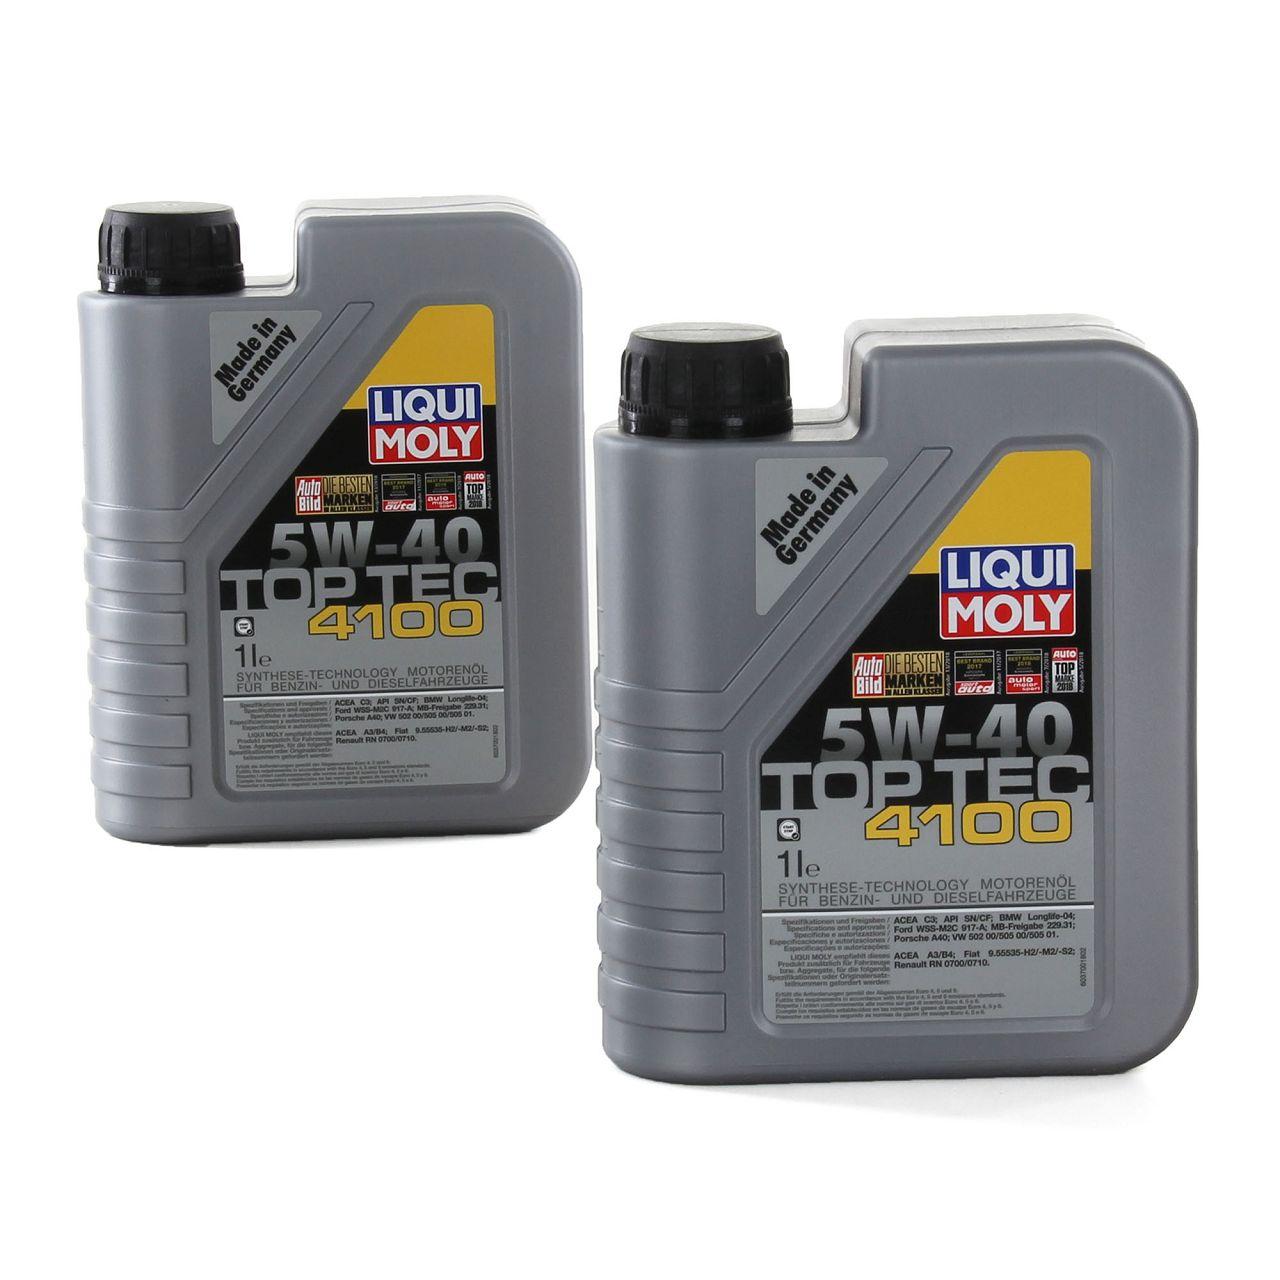 LIQUI MOLY Motoröl Öl TOP TEC 4100 5W40 5W-40 2L 2Liter 3700